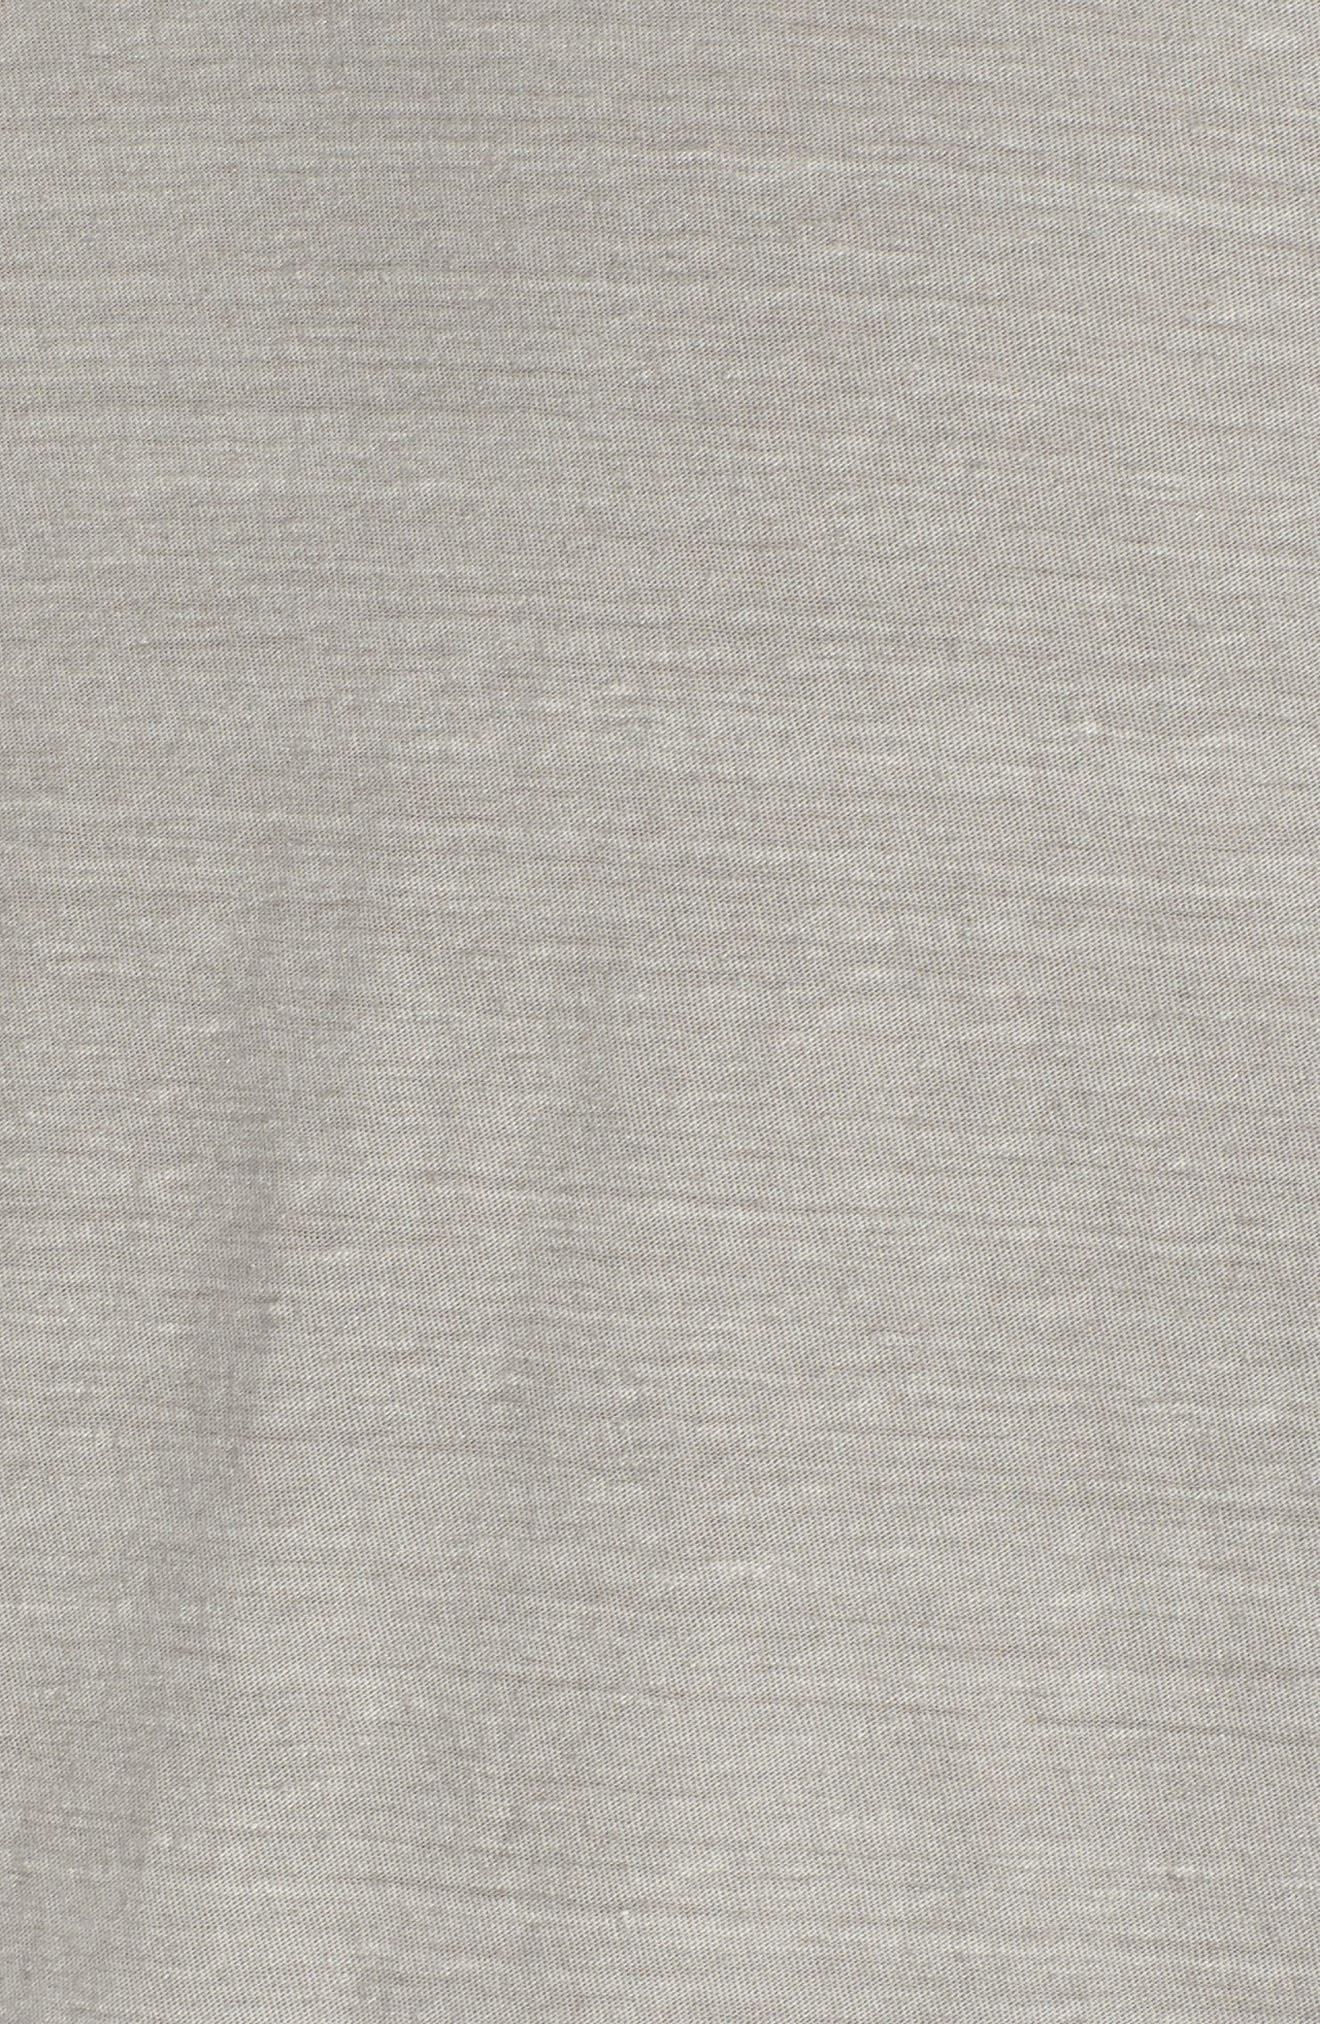 Regular Fit Slub Crewneck T-Shirt,                             Alternate thumbnail 5, color,                             056